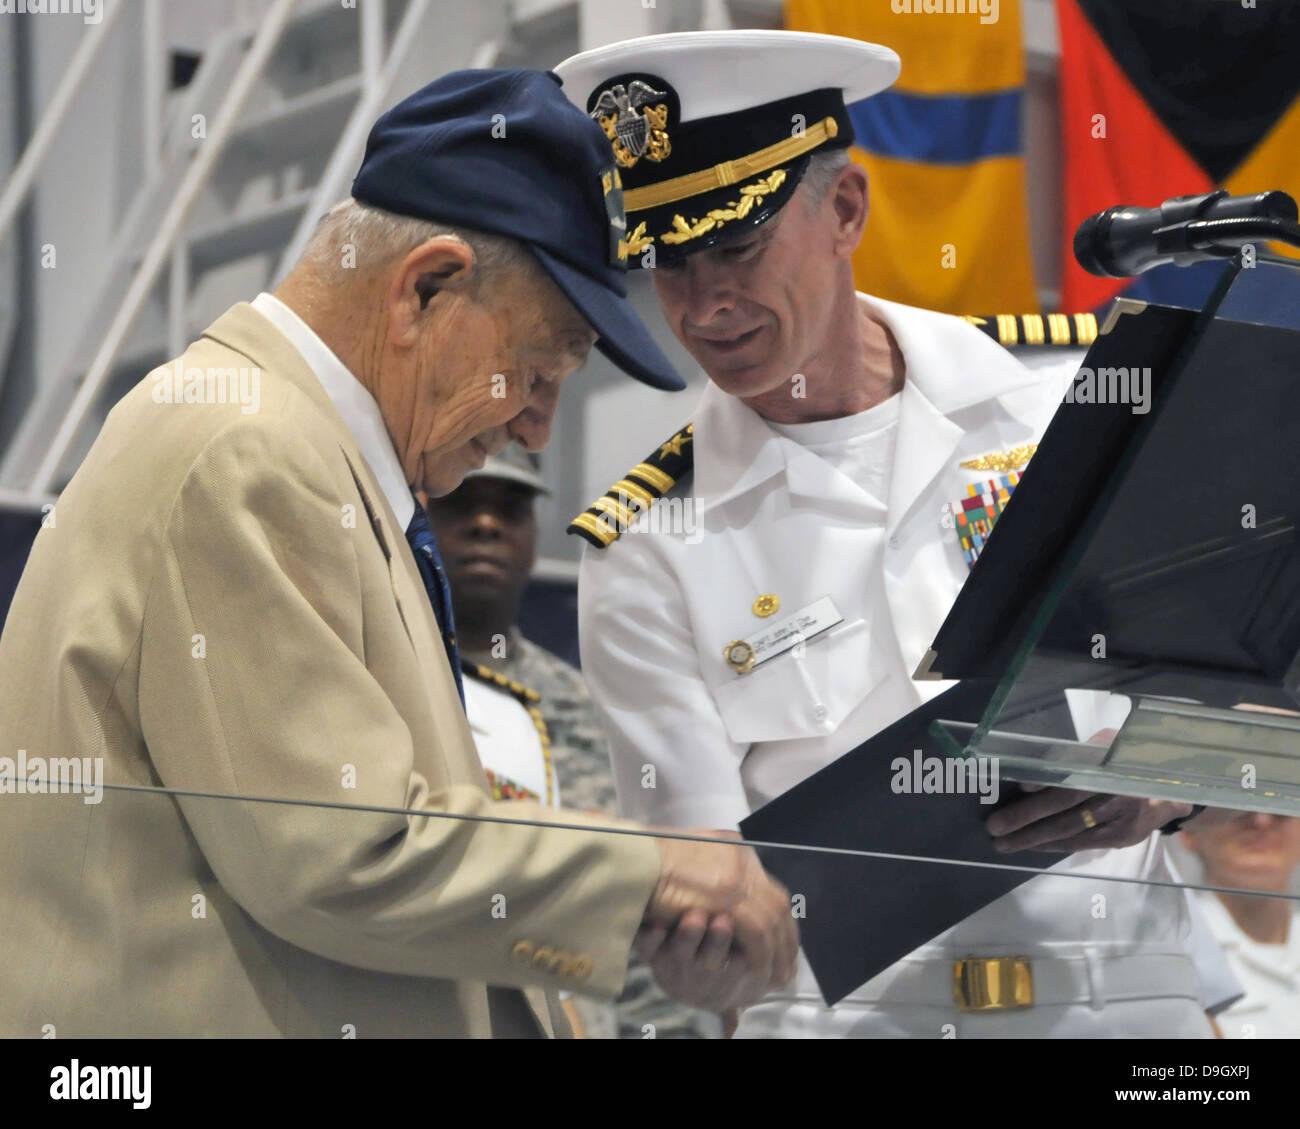 A World War II Navy veteran graduates boot camp. - Stock Image